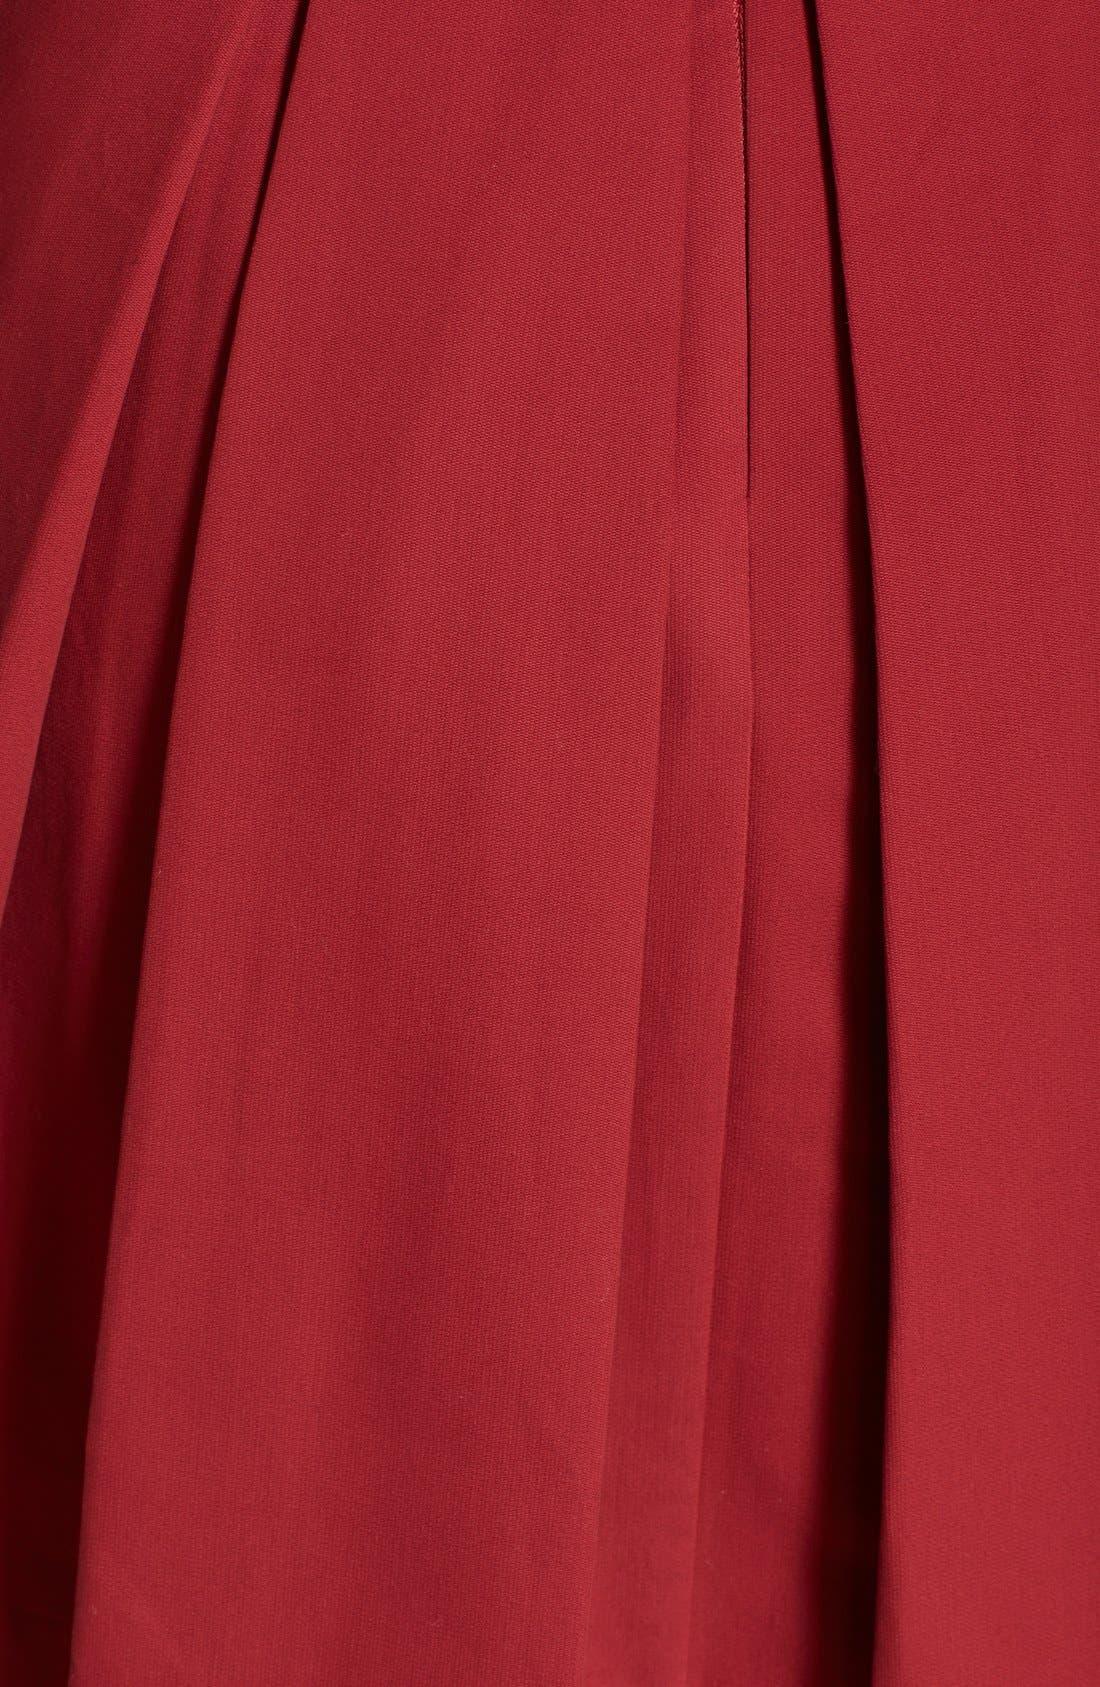 Alternate Image 4  - BB Dakota 'Dane' Pleat Fit & Flare Dress